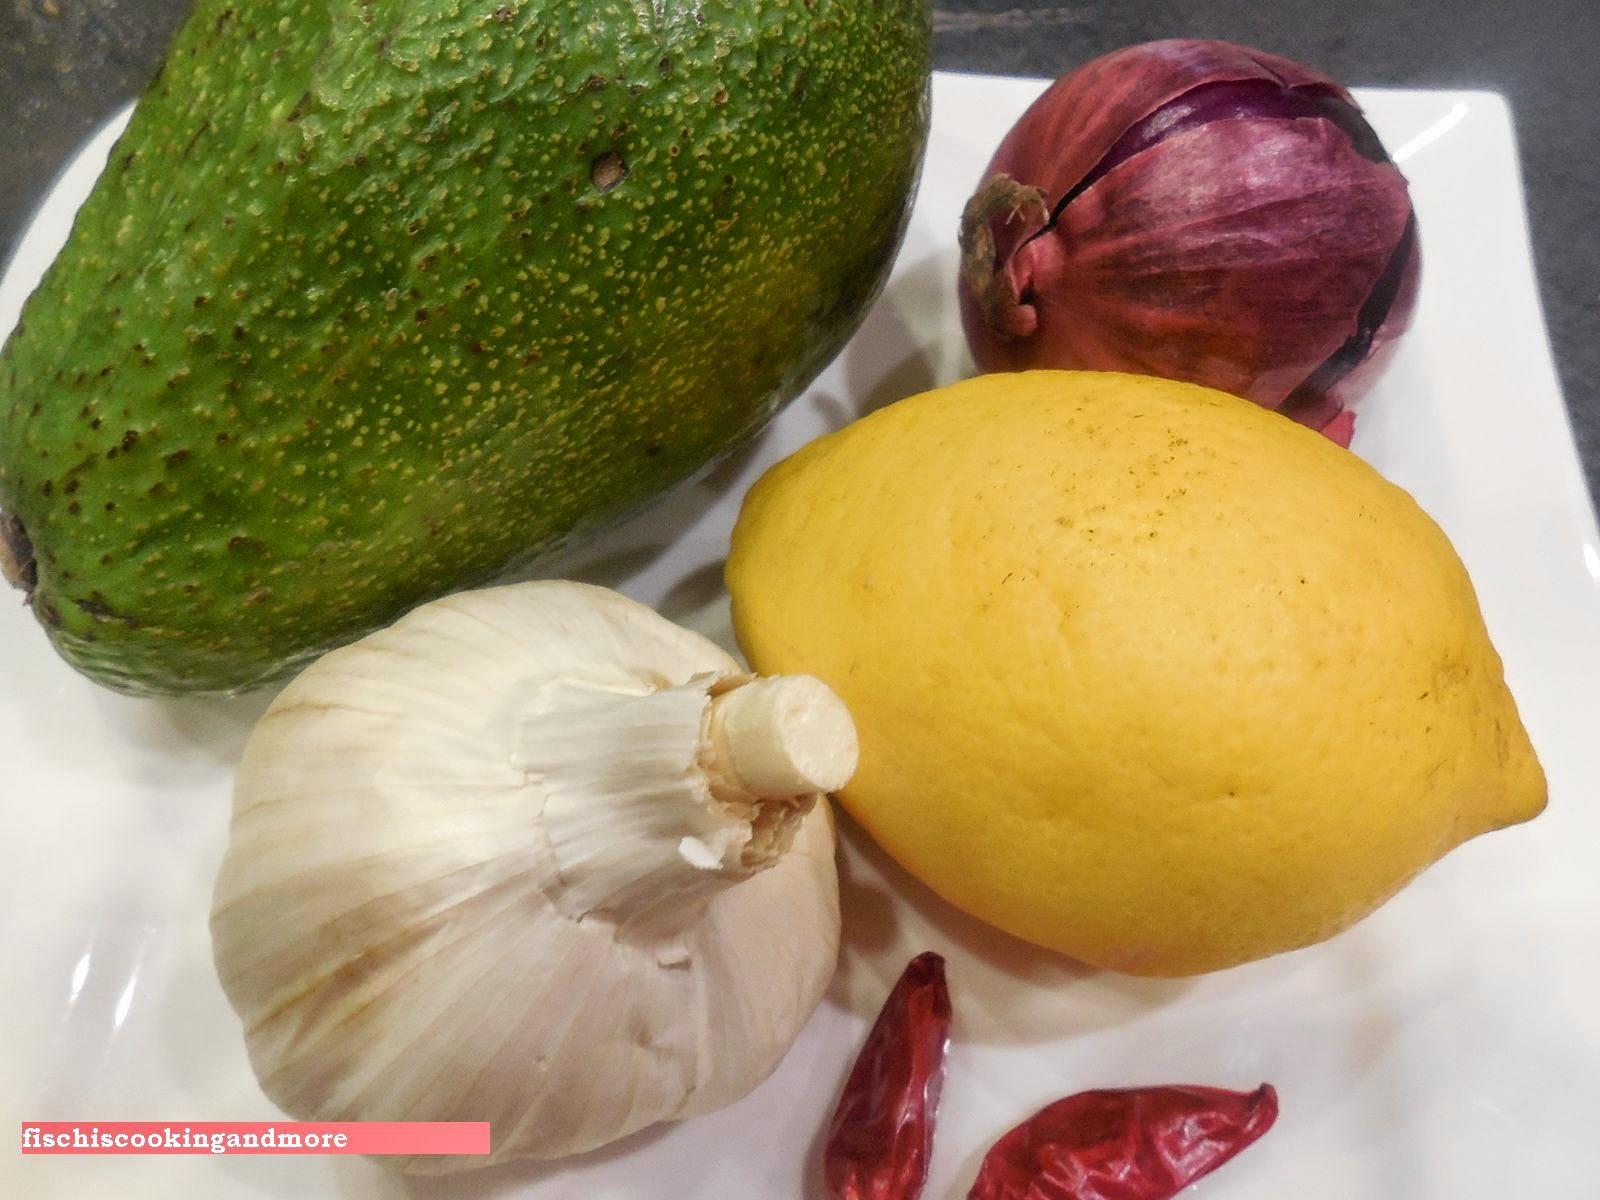 fischiscooking,avocadoaufstrich, guacamole